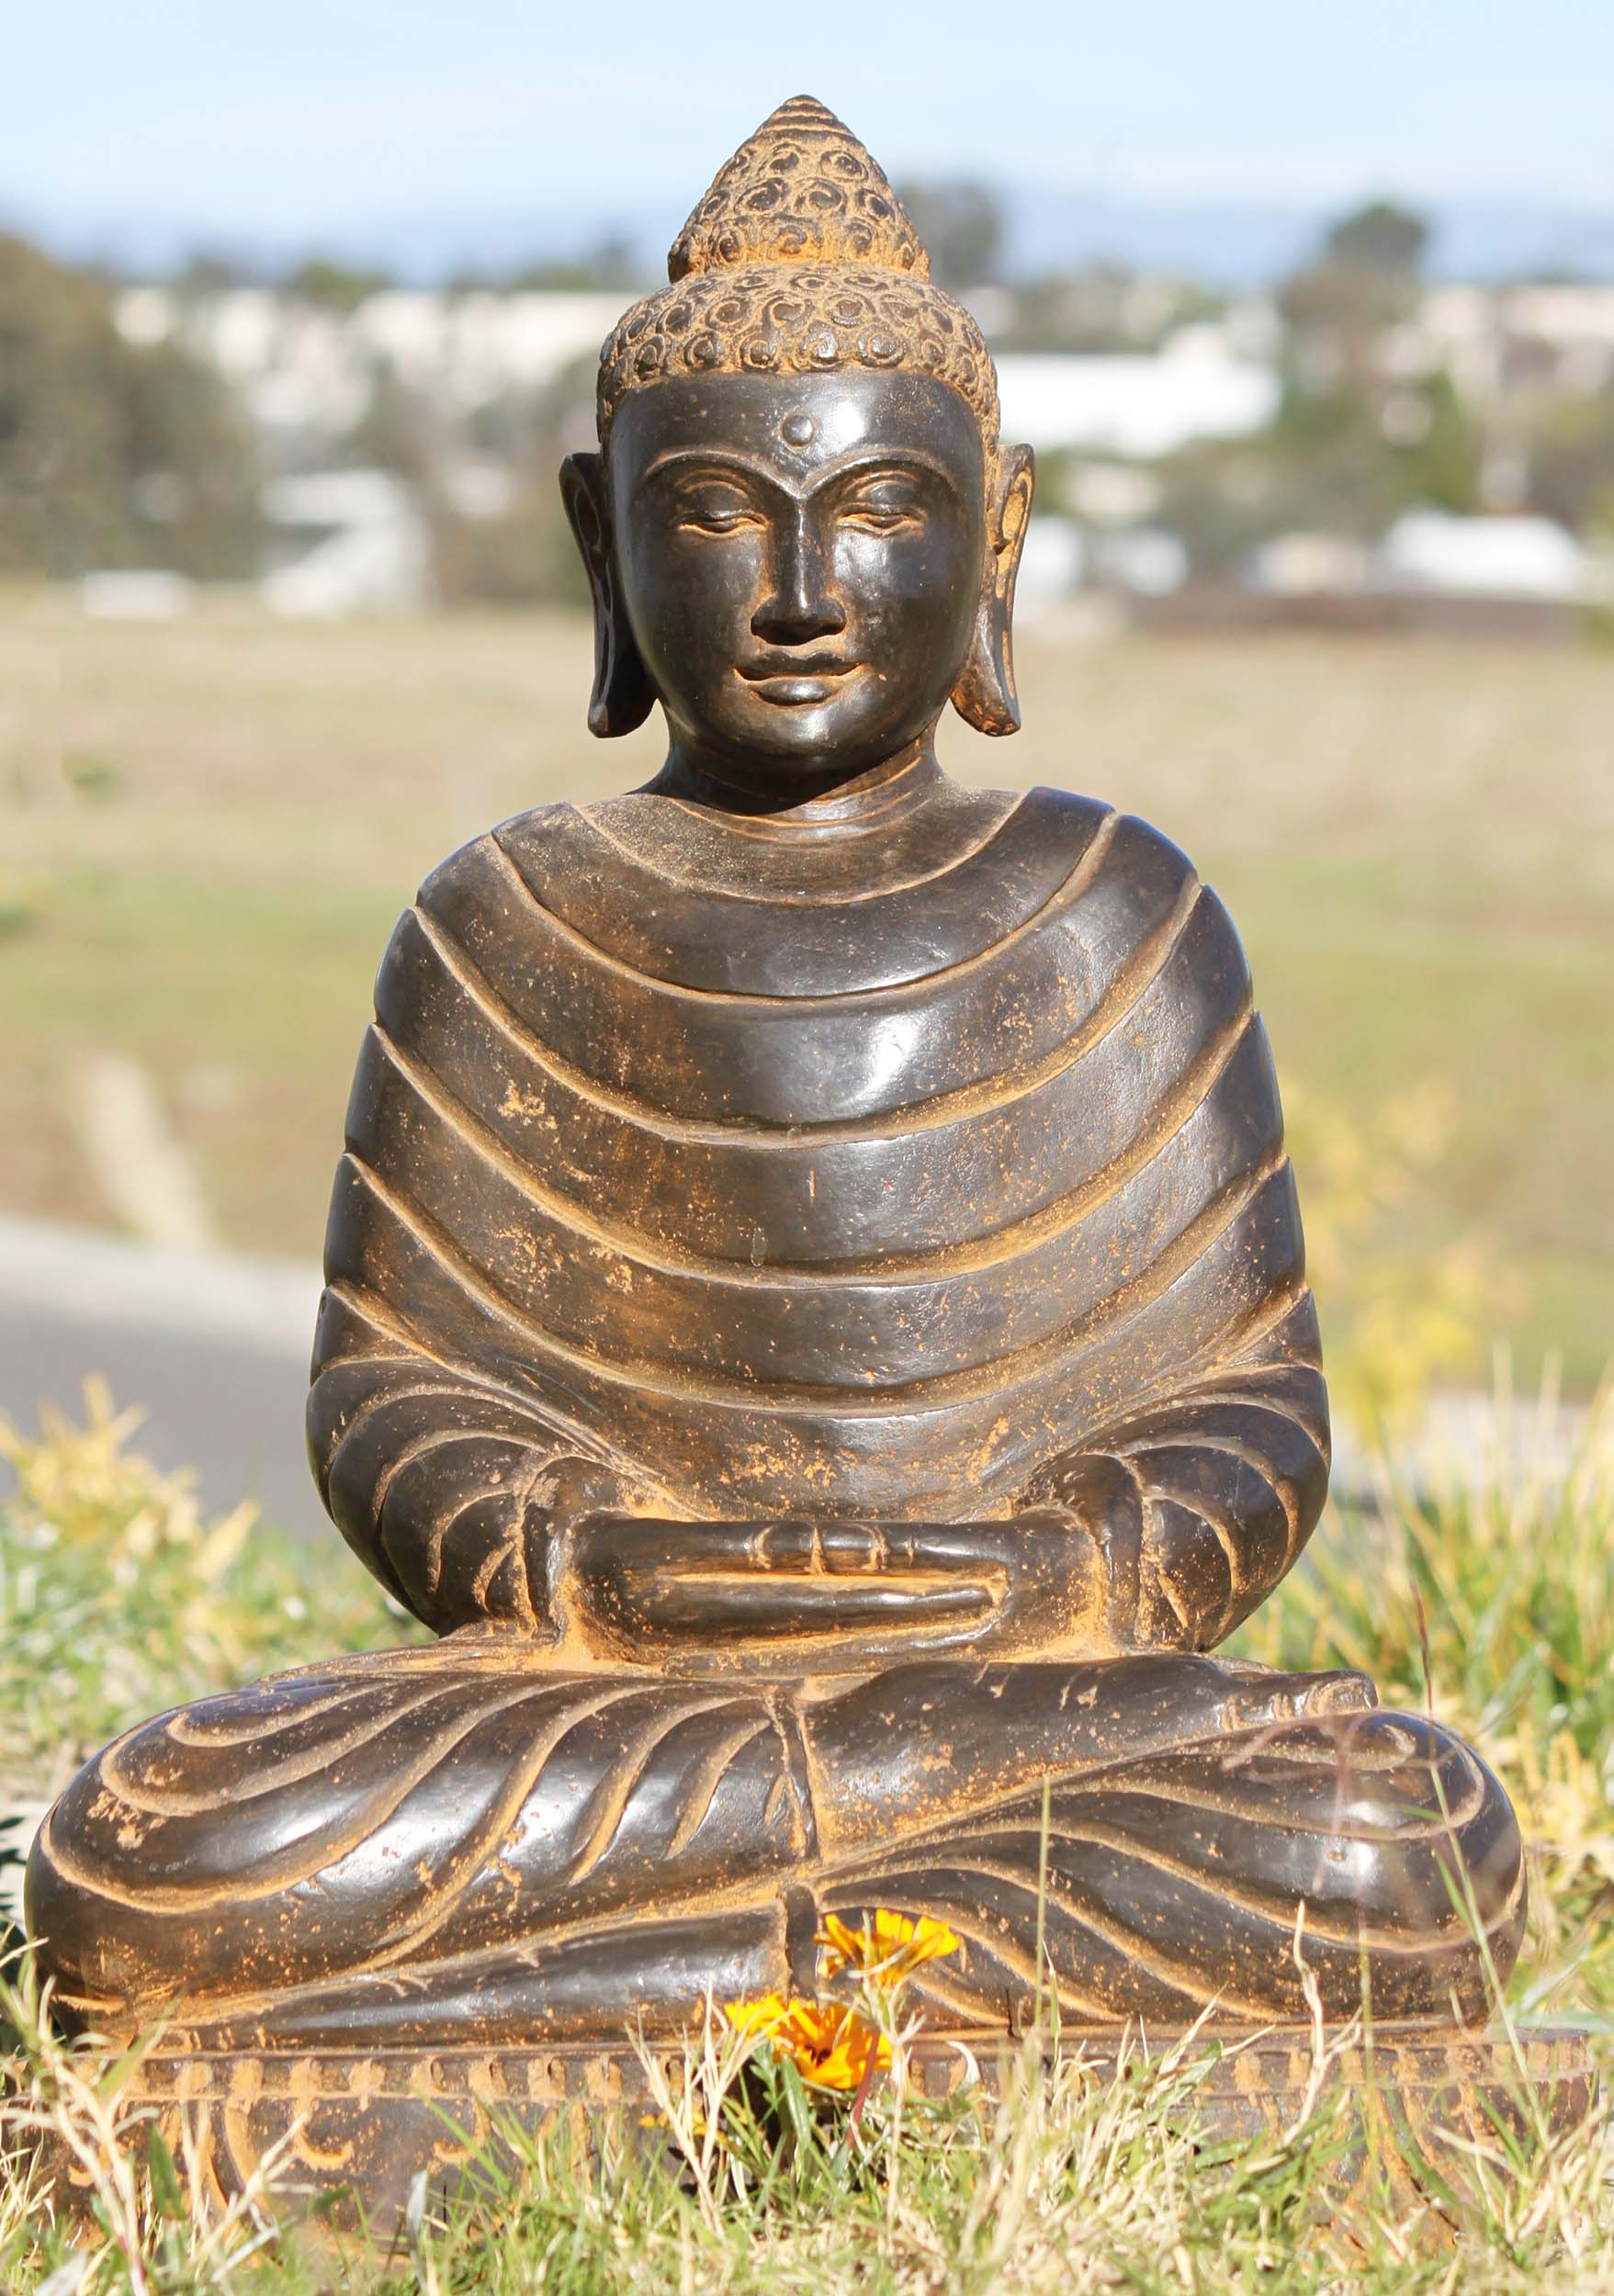 sold stone meditating garden buddha statue 22 105ls480 hindu gods buddha statues. Black Bedroom Furniture Sets. Home Design Ideas